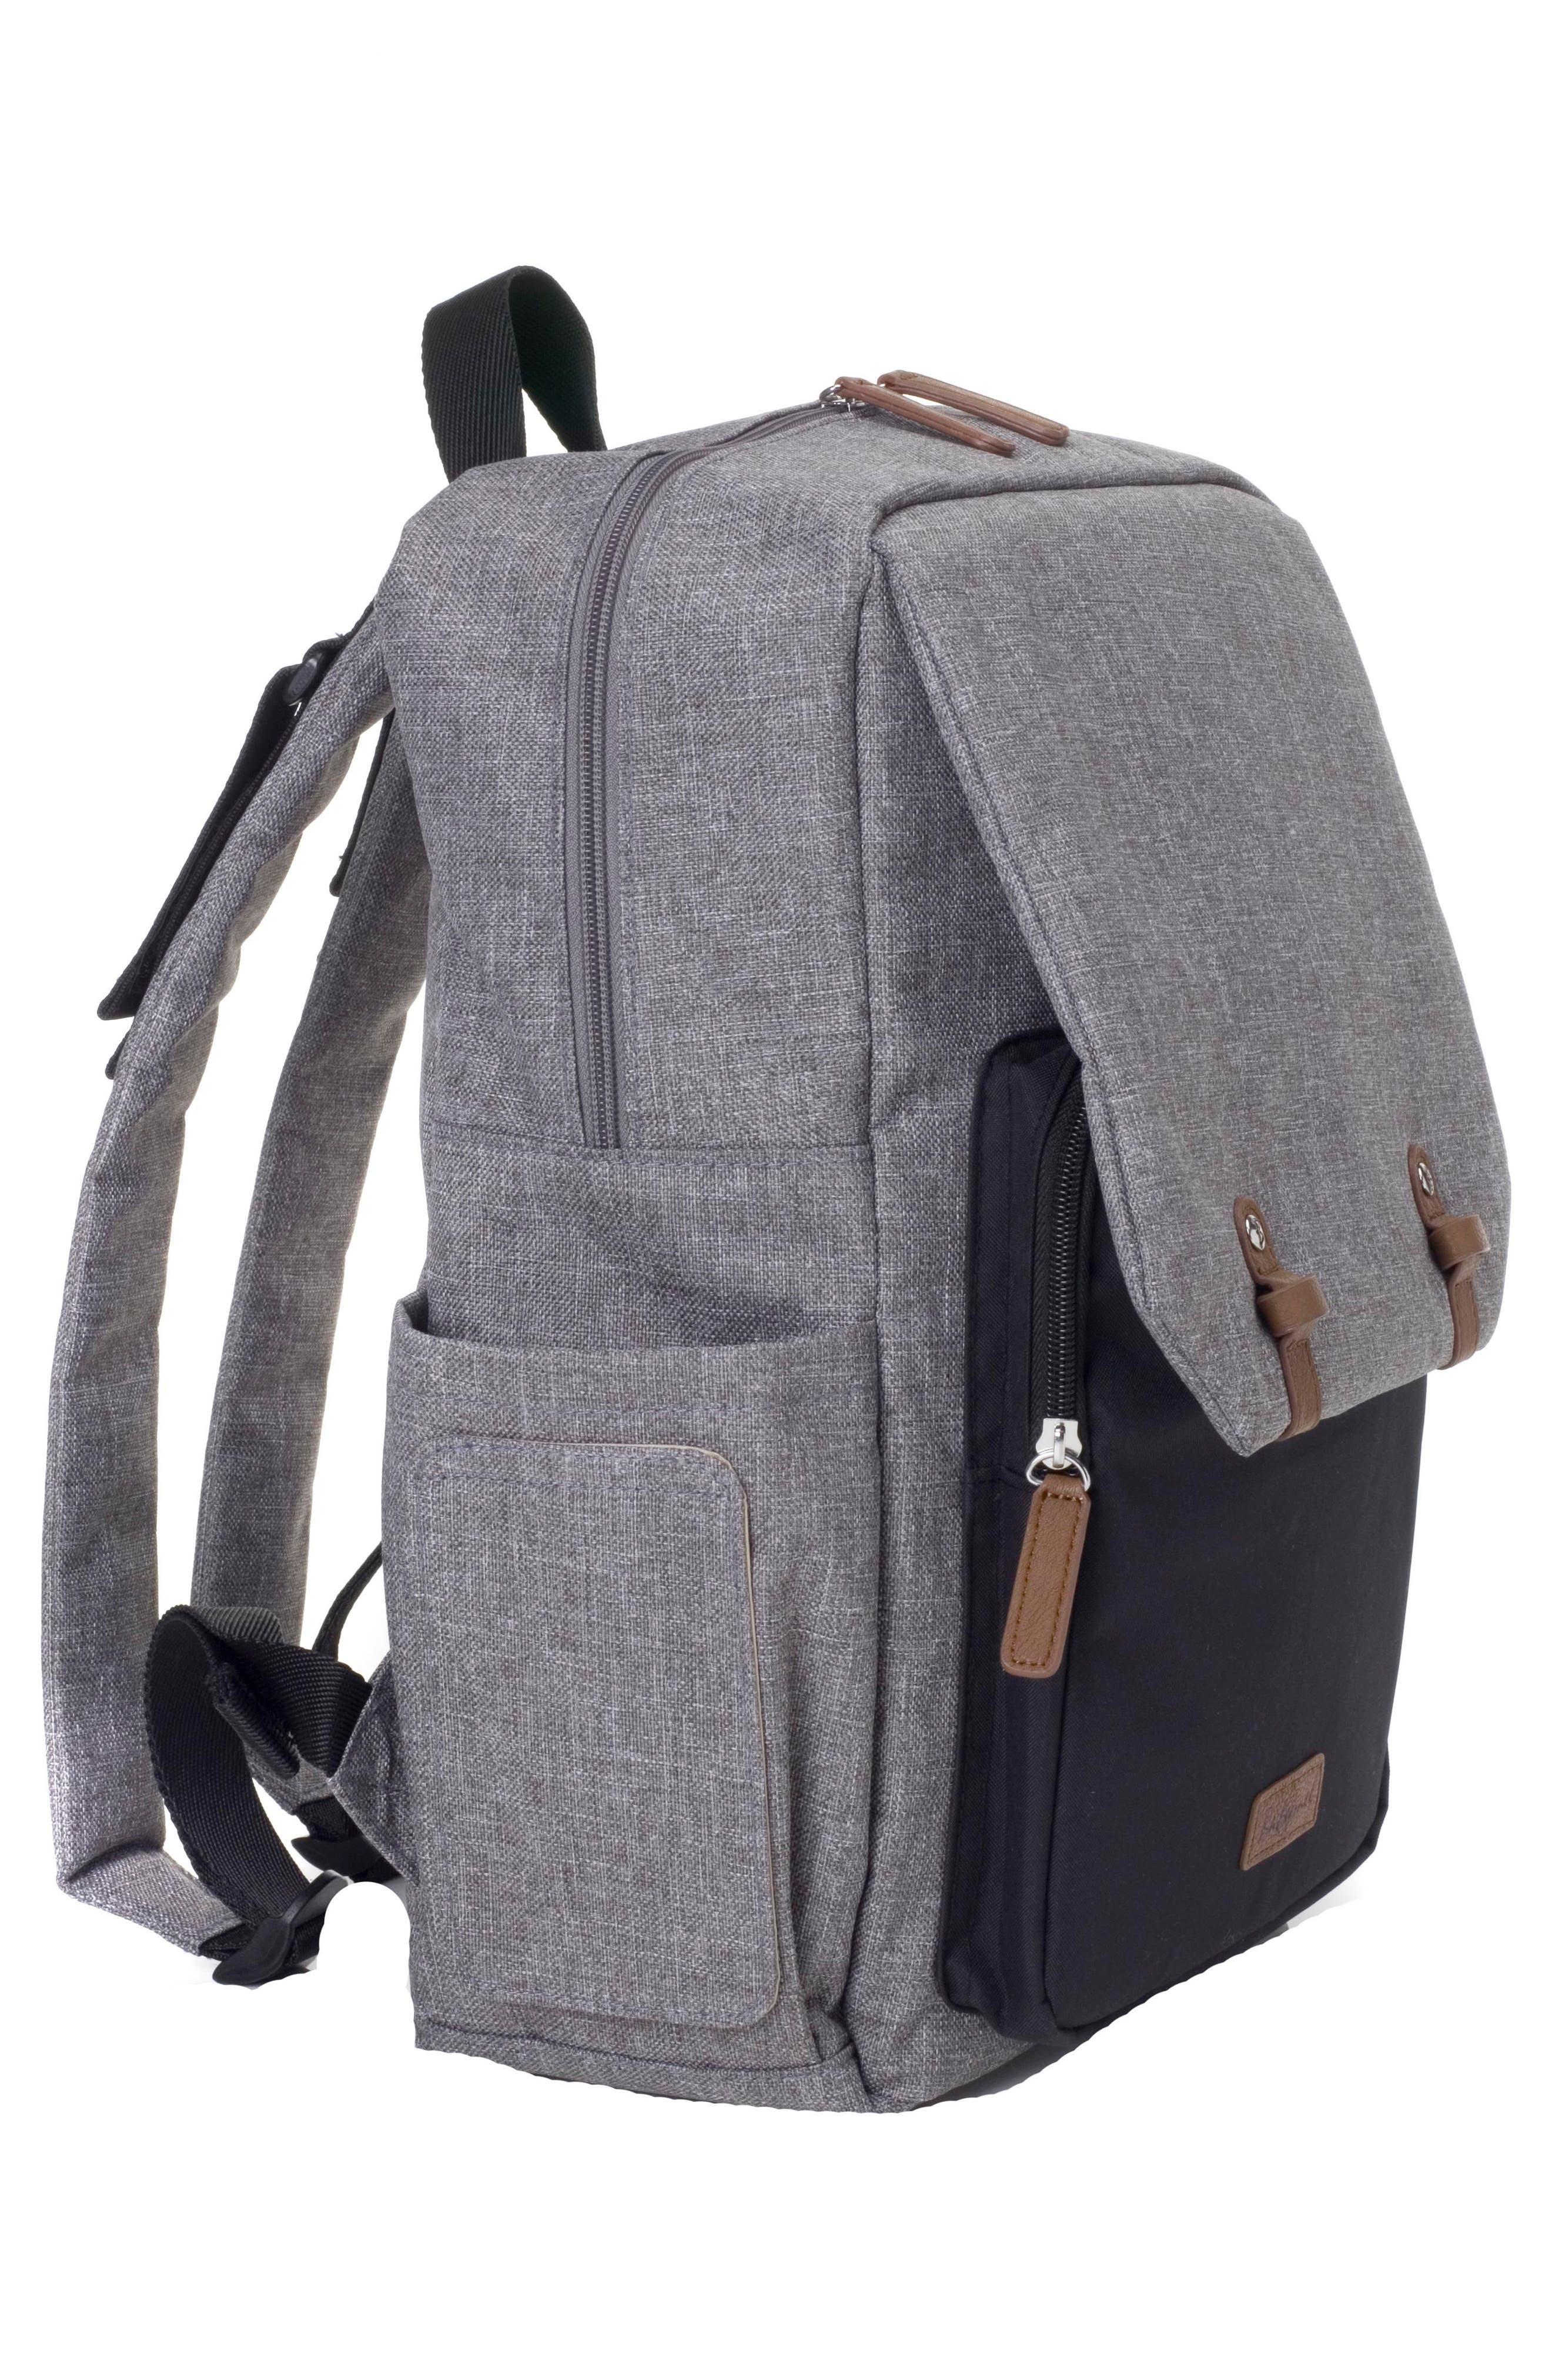 George Water Resistant Diaper Backpack,                             Alternate thumbnail 9, color,                             BLACK/ GREY